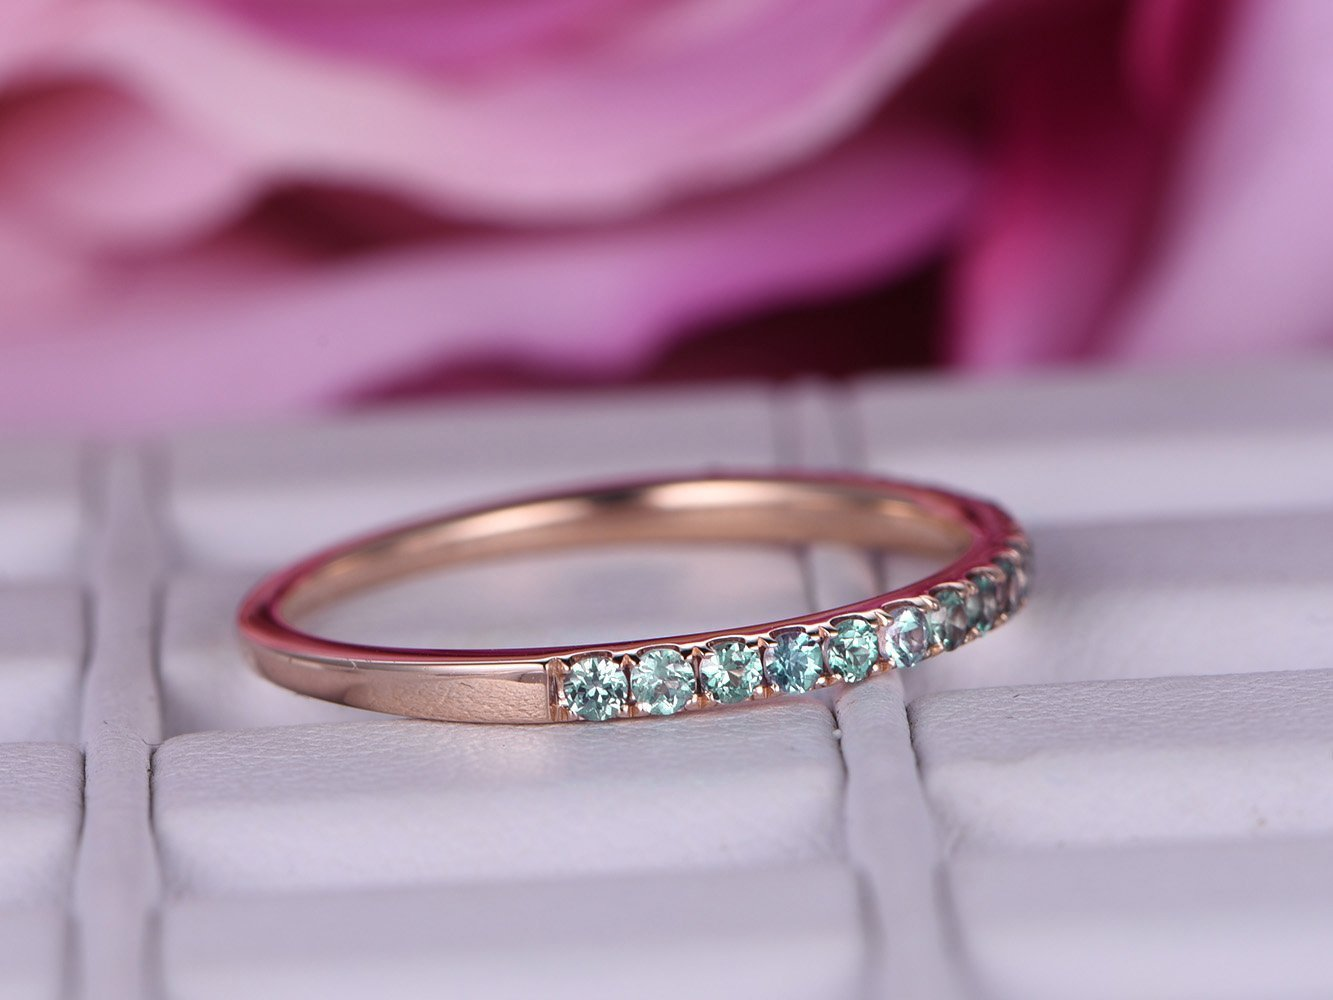 Green Alexandrite Wedding Band Half Eternity Anniversary Ring 14K Rose Gold